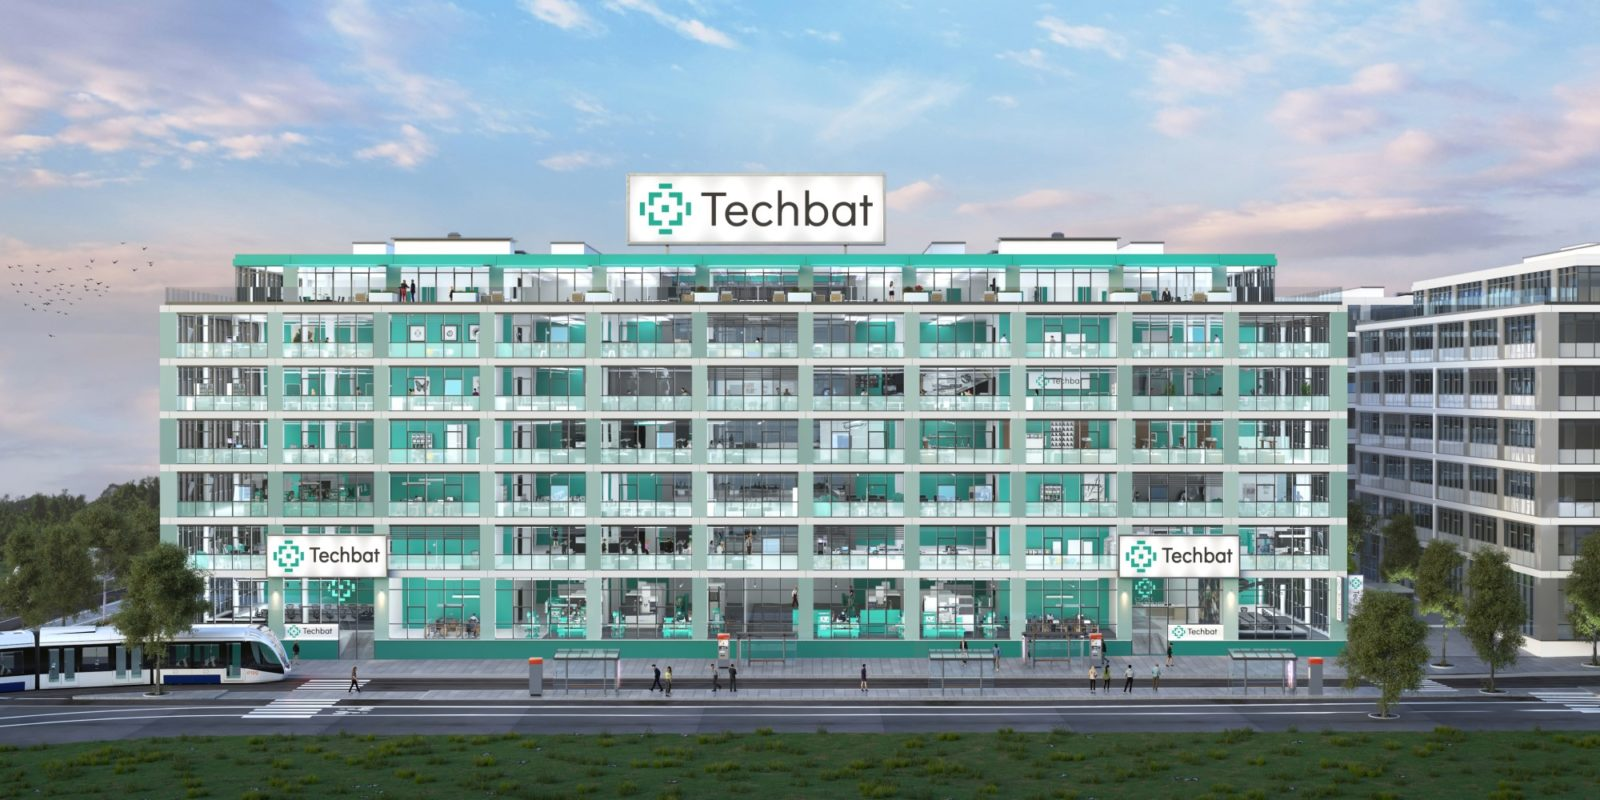 EPT_Techbat_site-1600x800